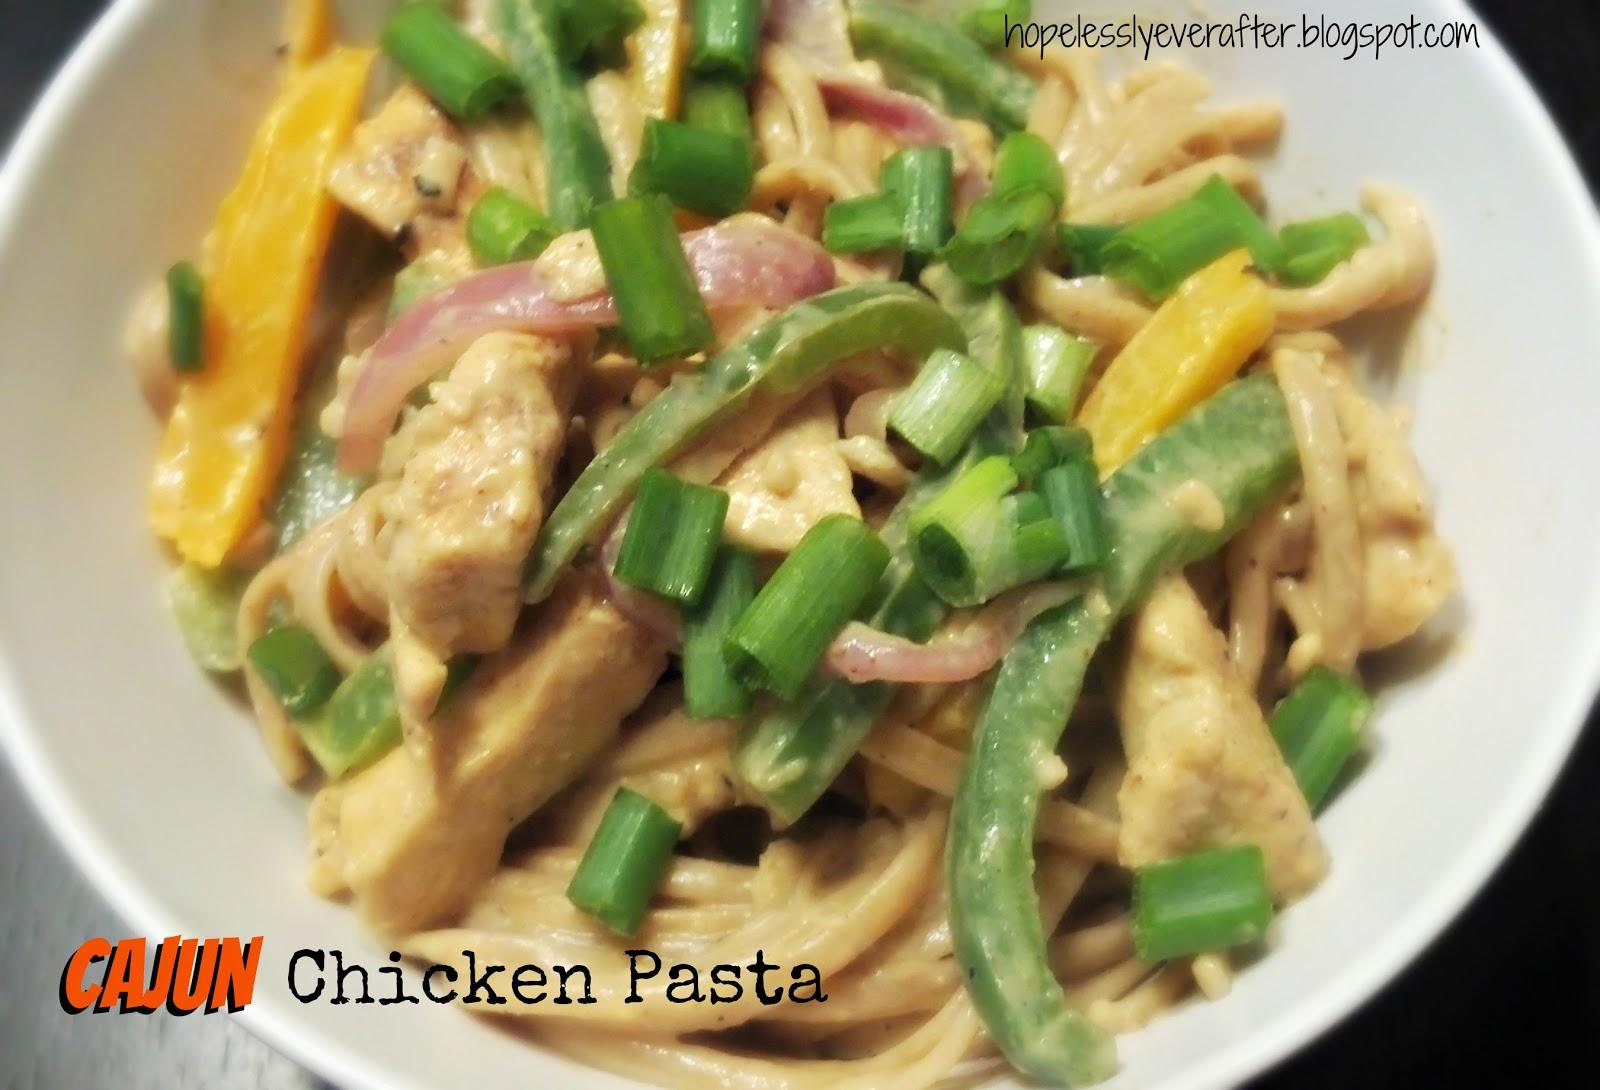 Hopelessly Ever After: Cajun Chicken Pasta